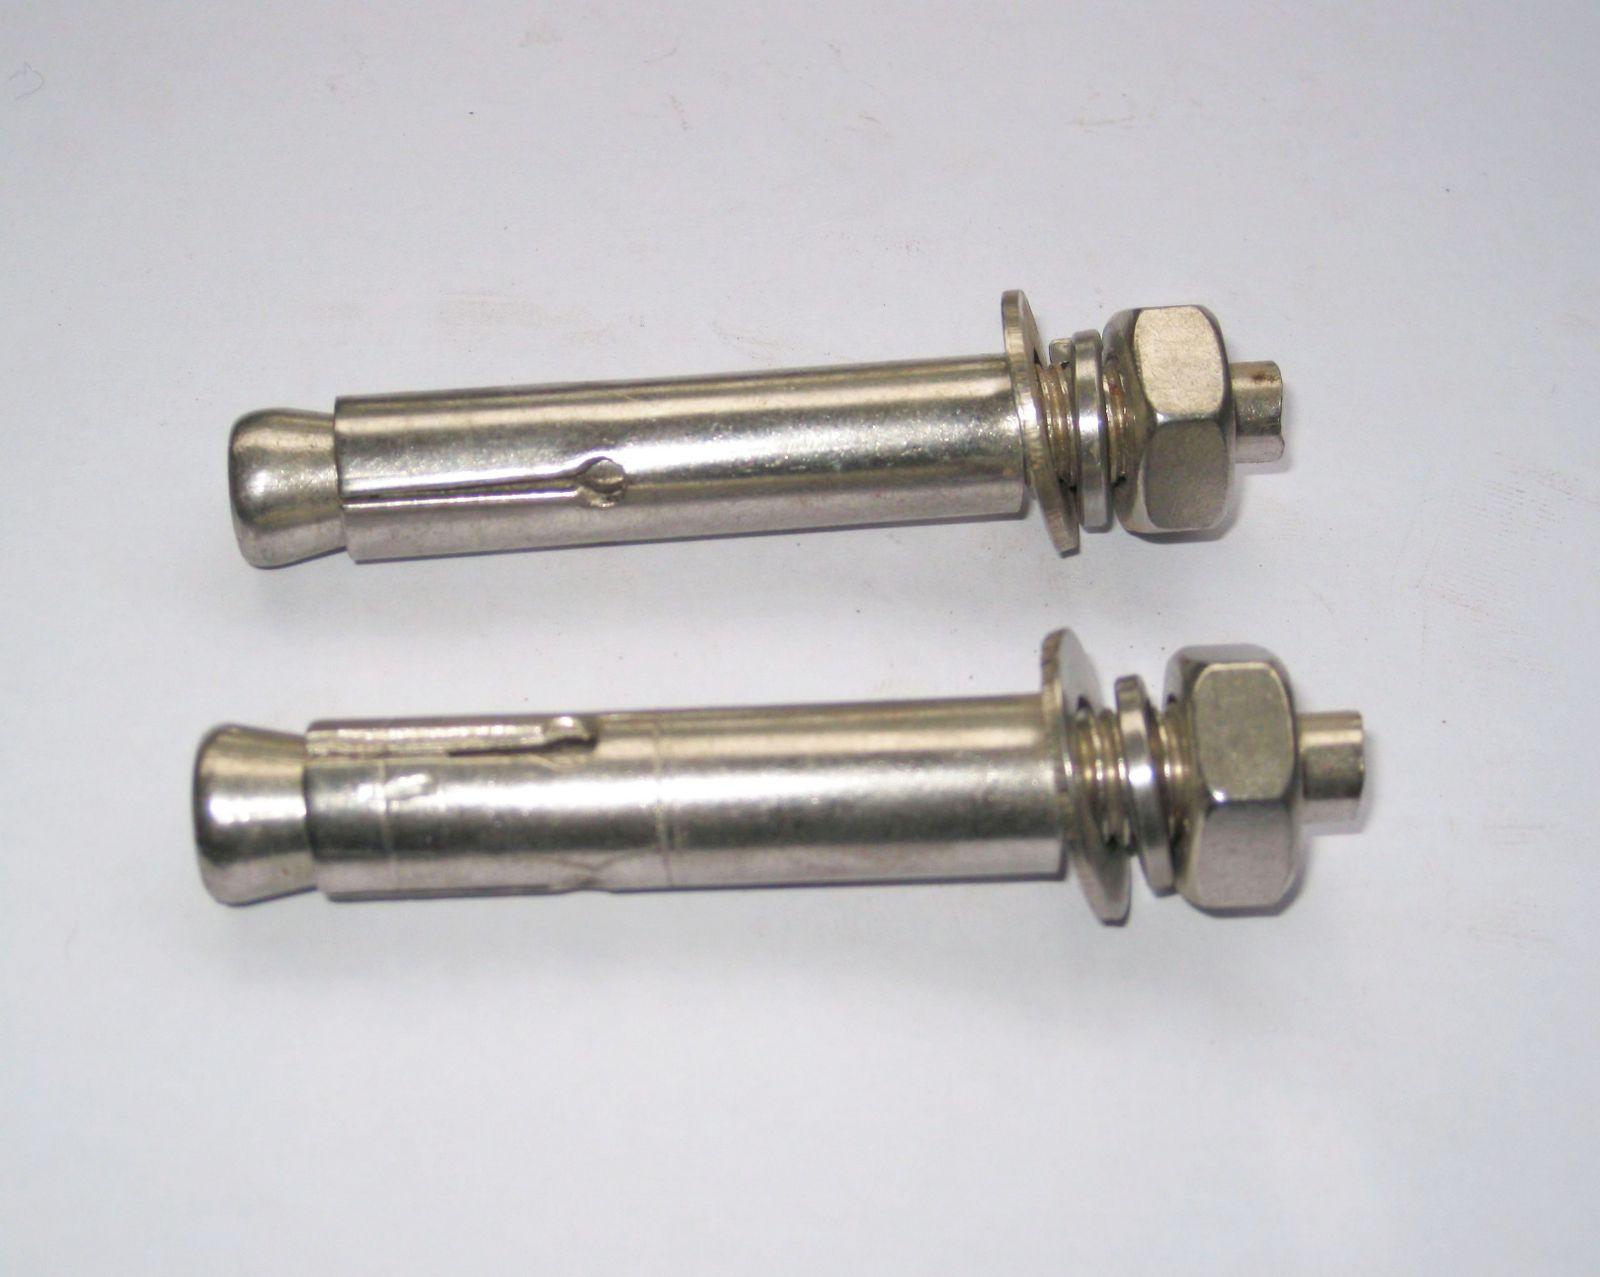 Tắc kê sắt 6x50mm TGCN-15438 Vietnam